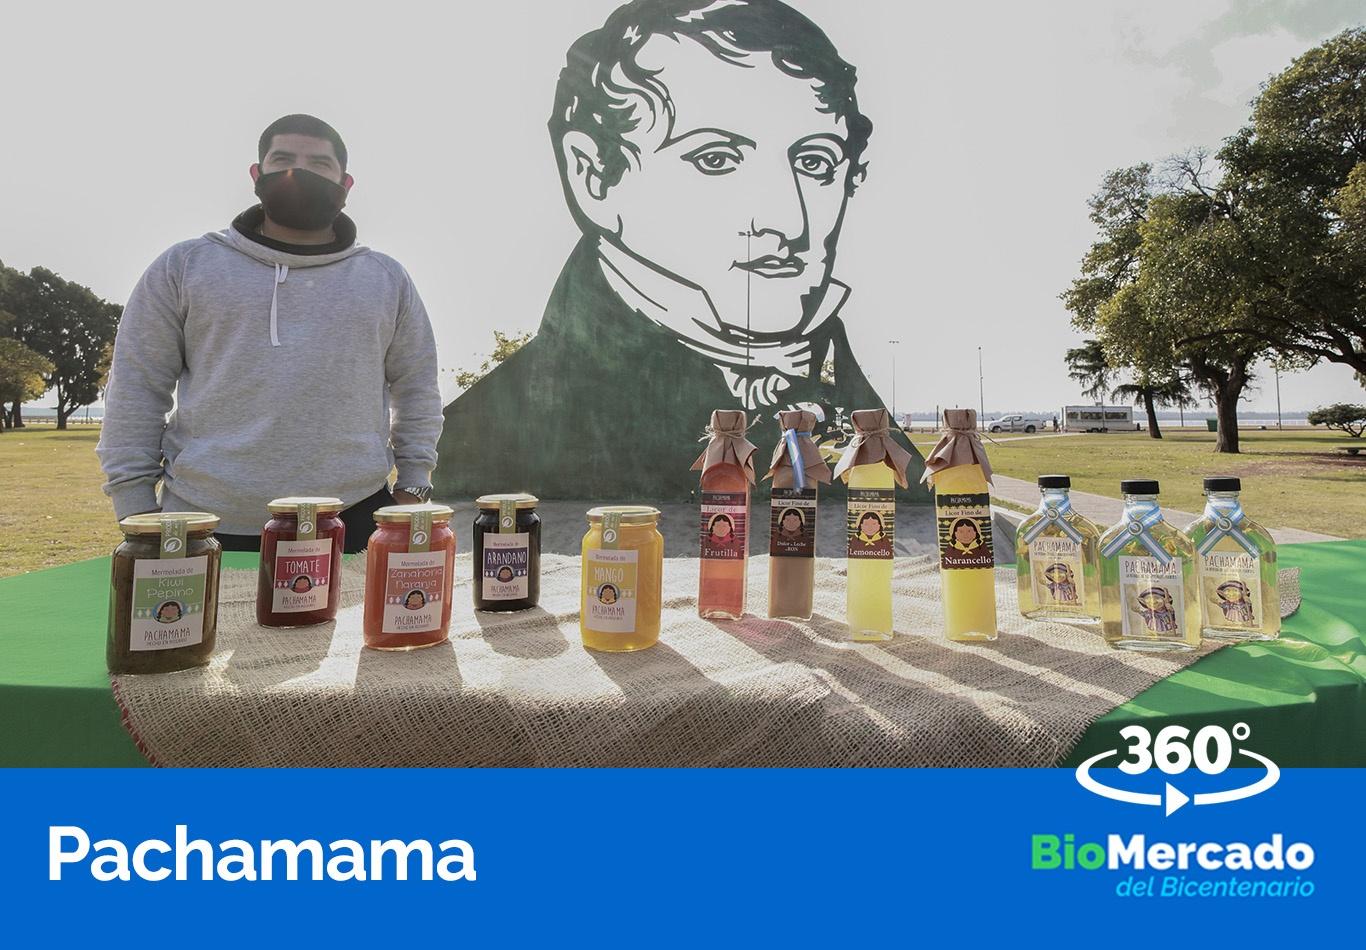 Modelo BioMercado pachamama